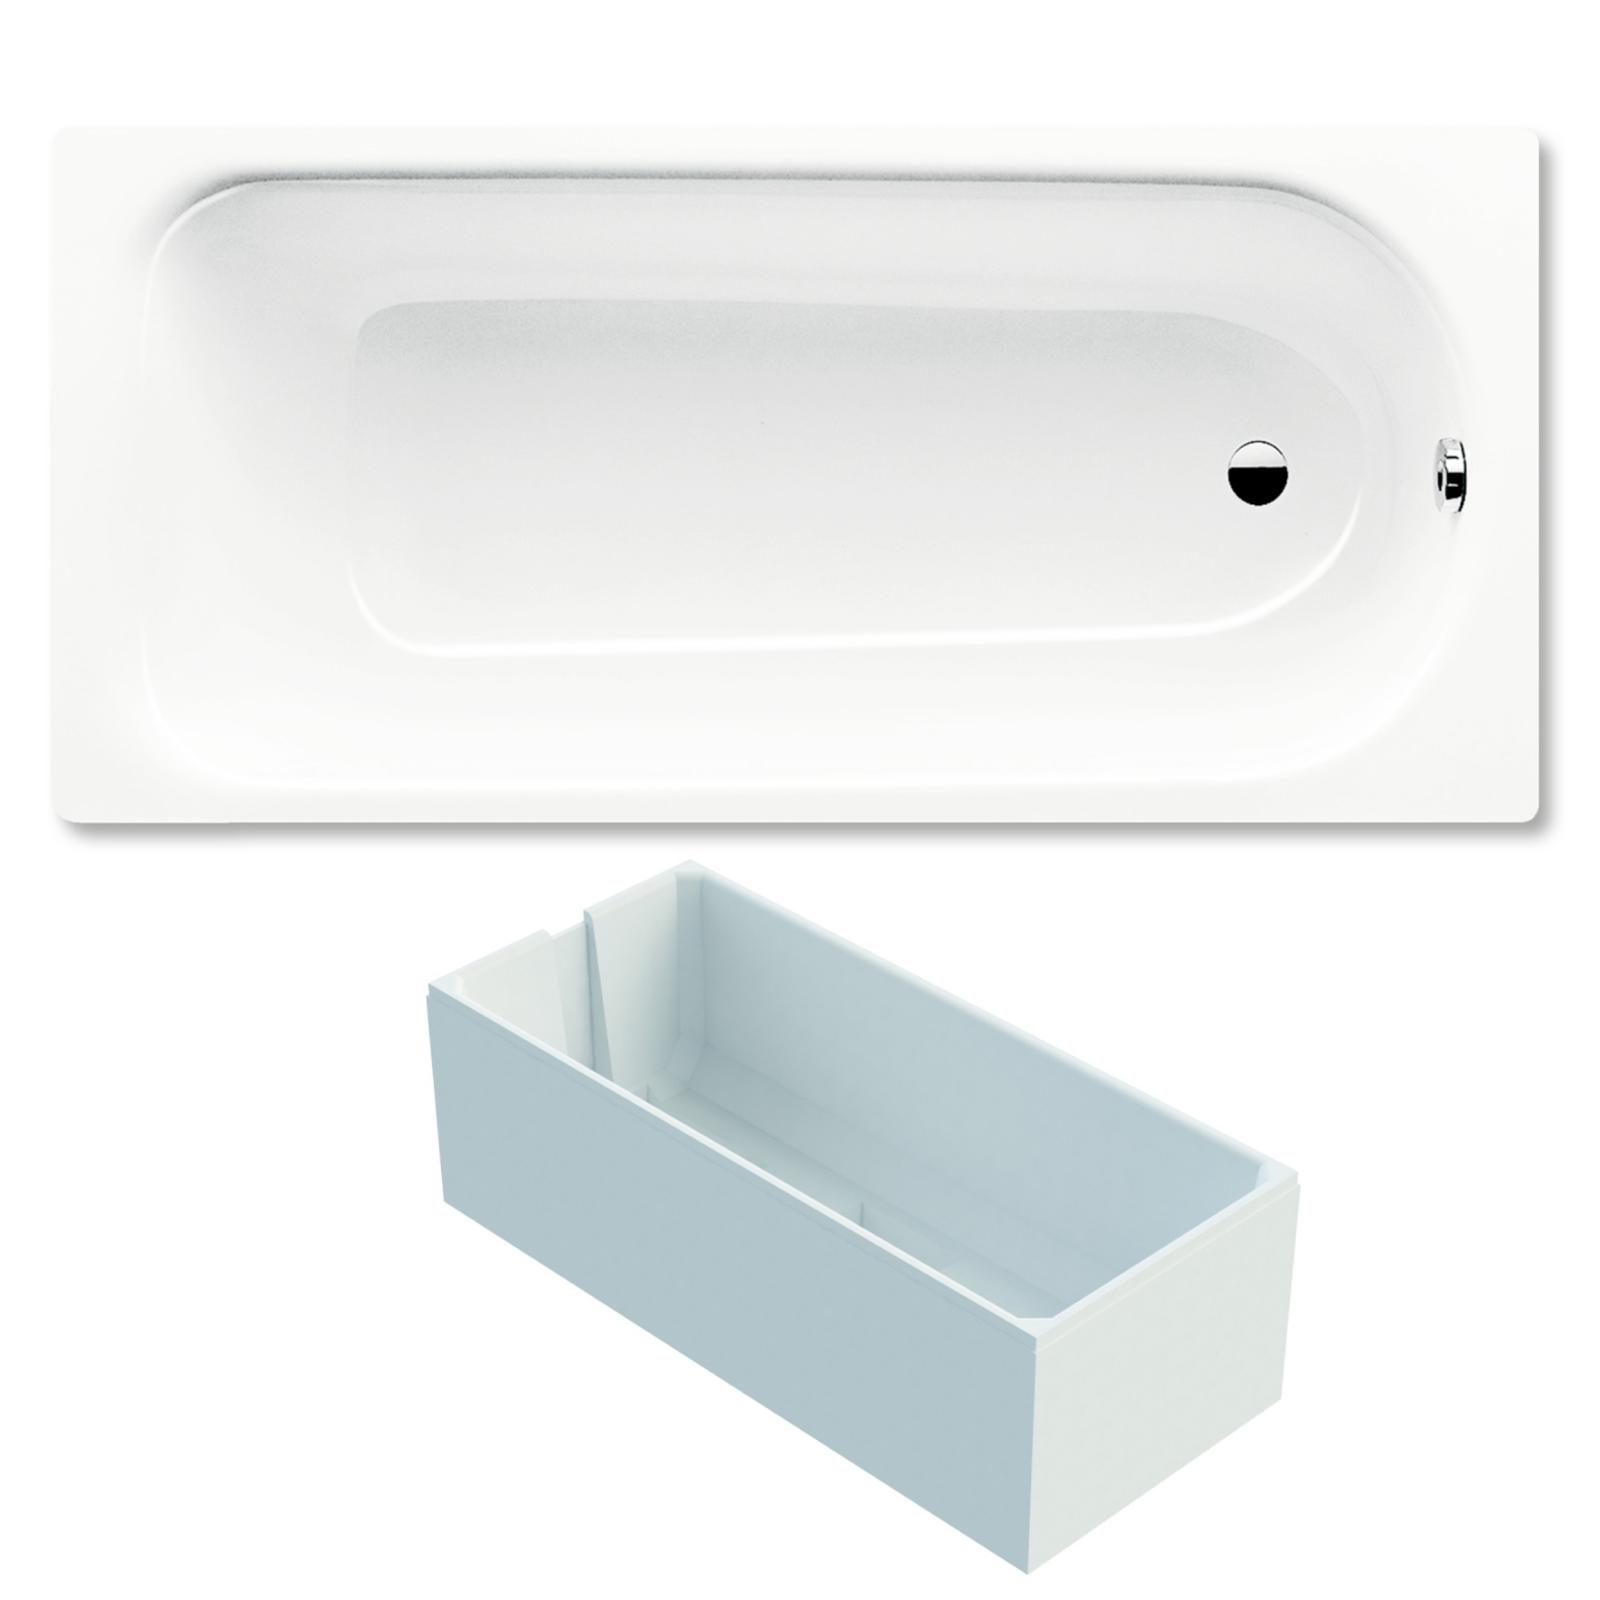 kaldewei saniform plus badewanne 180x80 cm stahl 3 5 mm modell 375 1 weiss inklusive tr ger. Black Bedroom Furniture Sets. Home Design Ideas